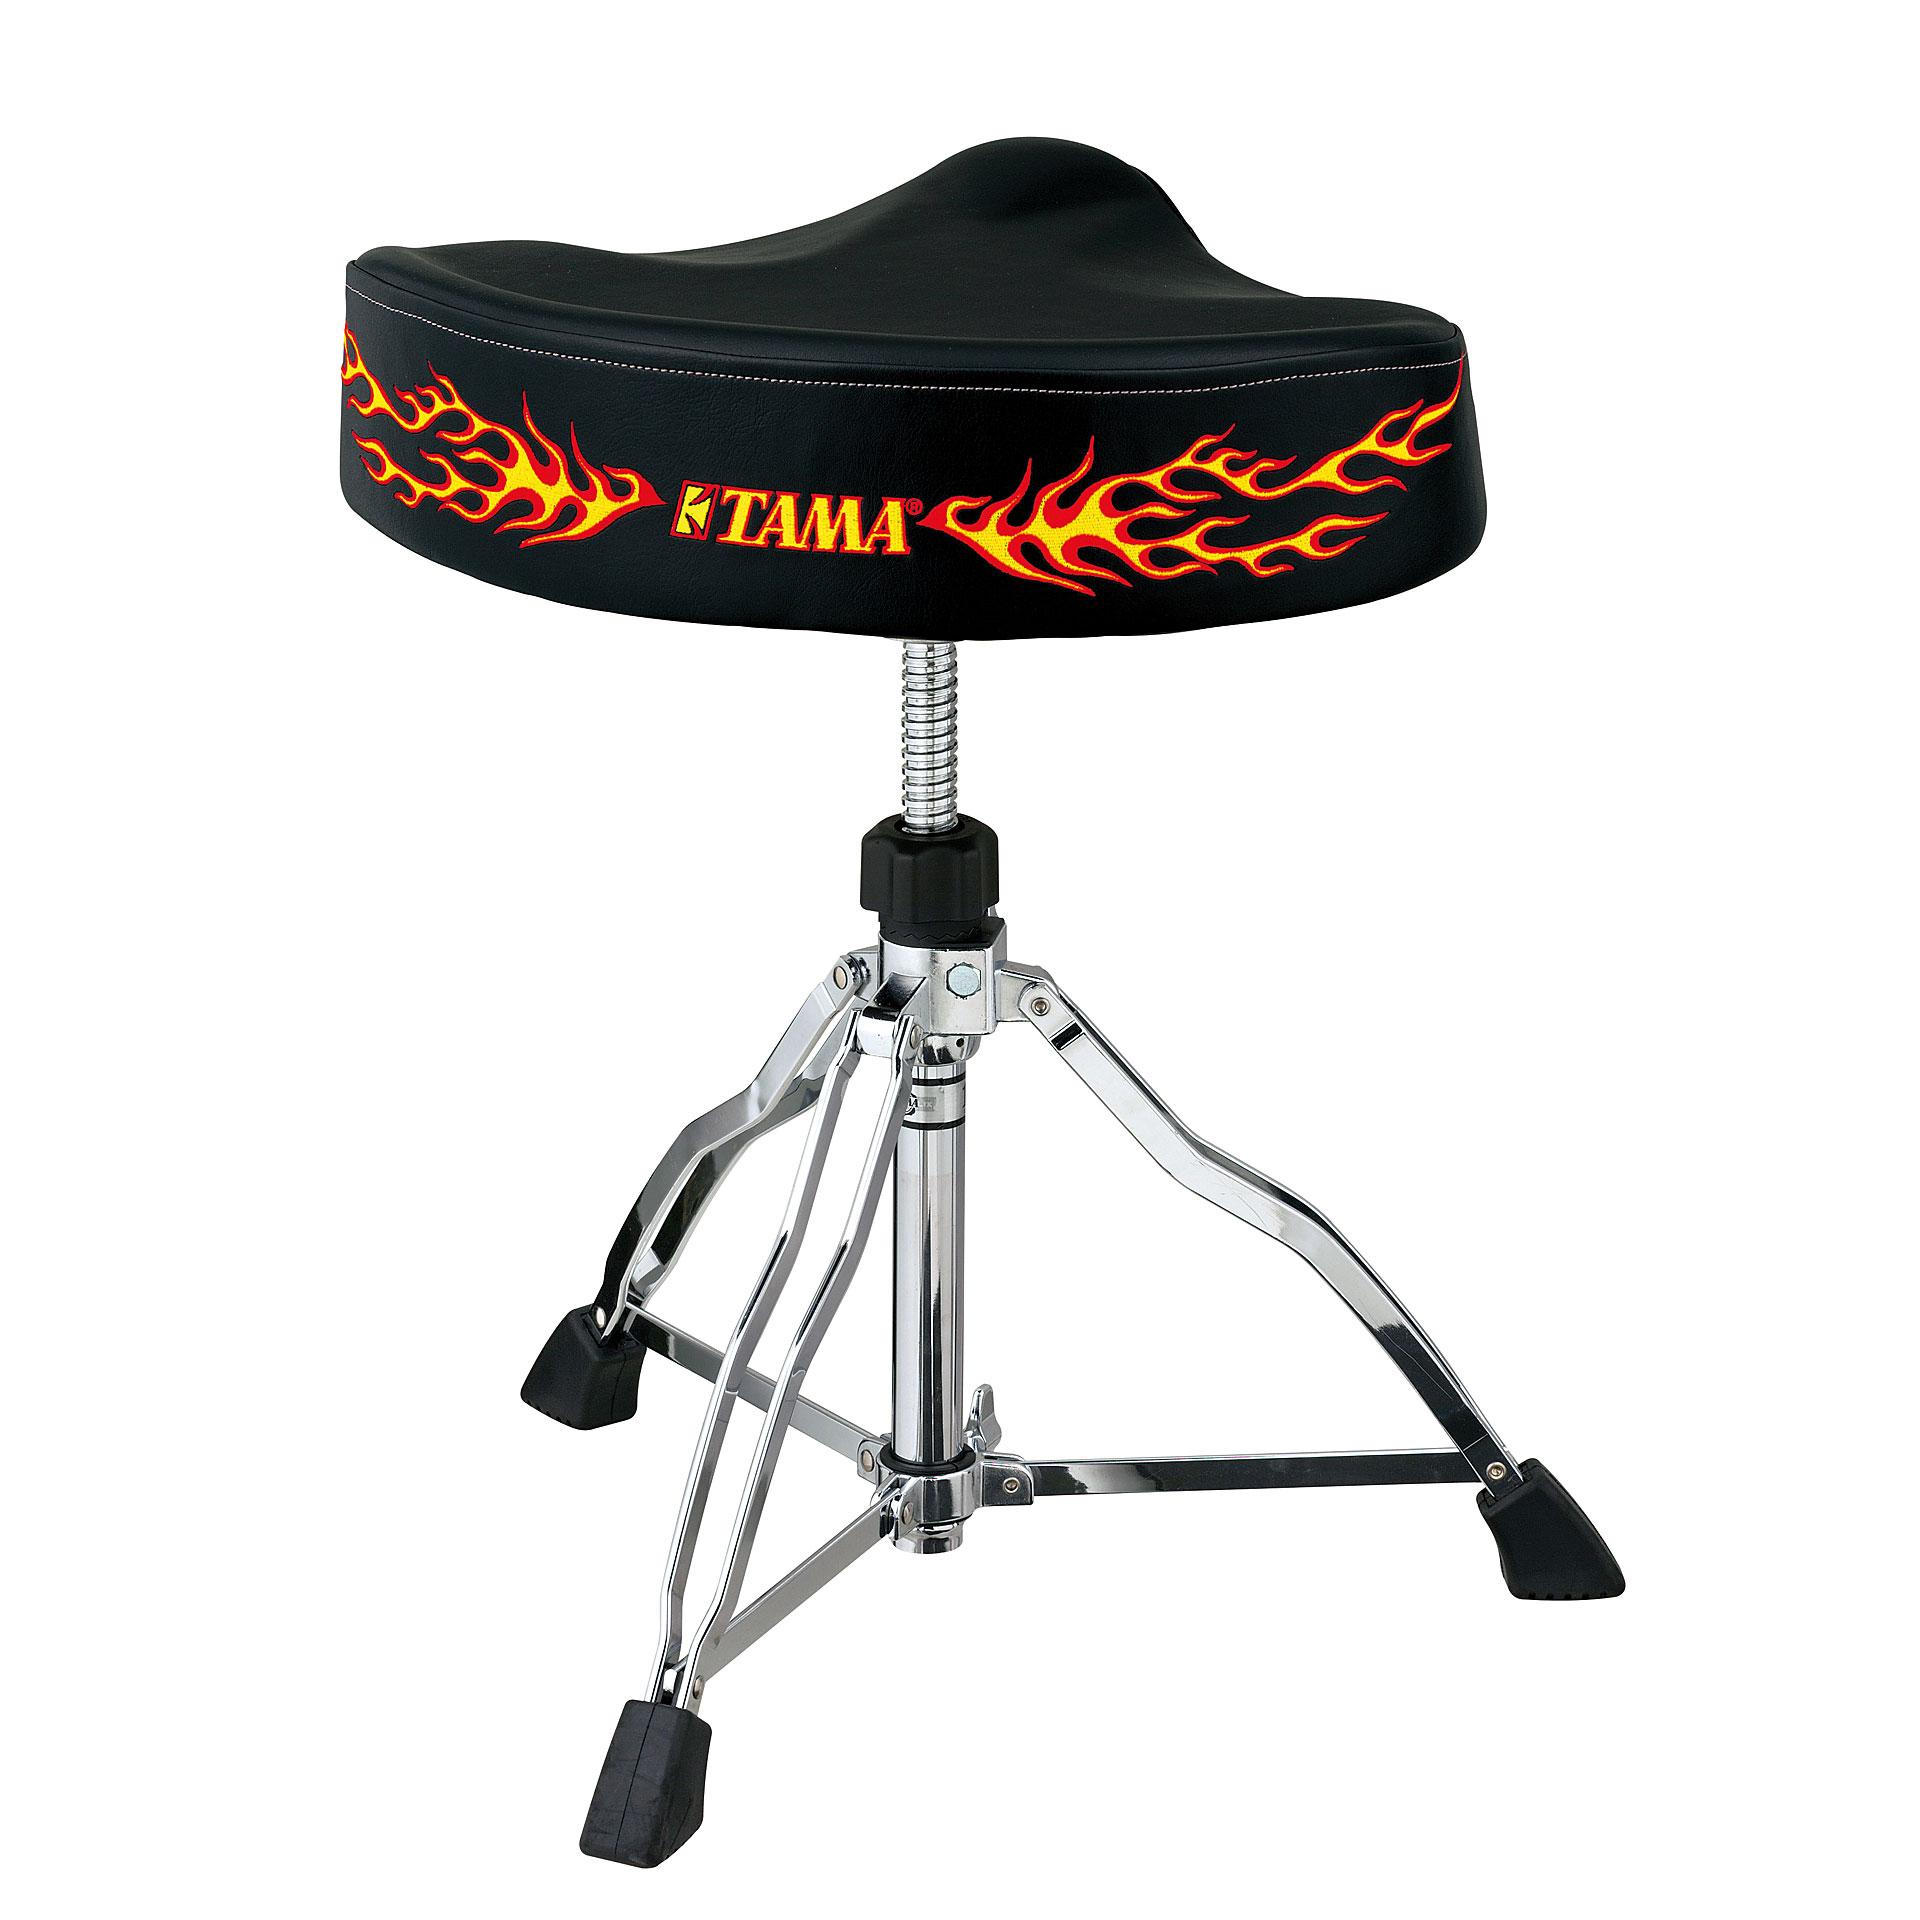 Tama 1st Chair Ht530fe Hot Seat Ltd 171 Drum Throne